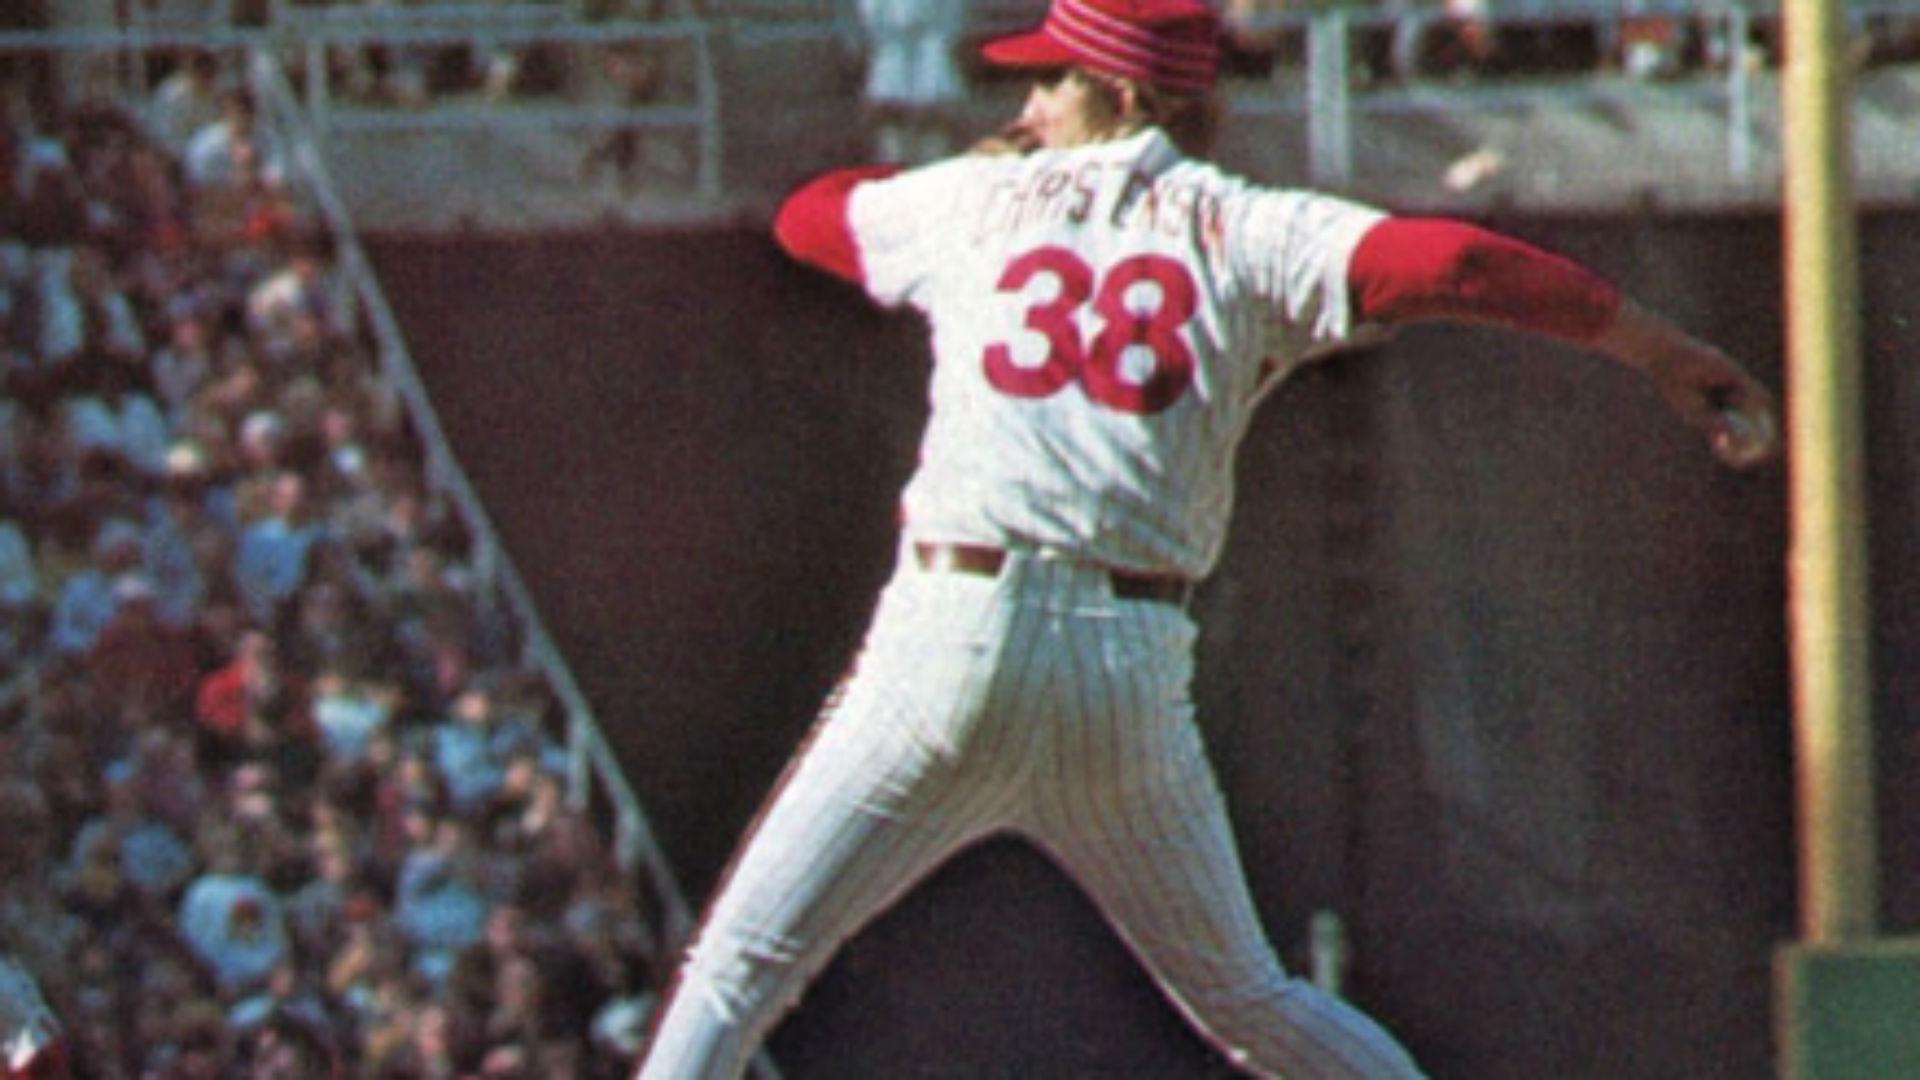 Phillies-hat-1976-052616-ftr_15i9jusrmb2e61ol5hlt5za35l